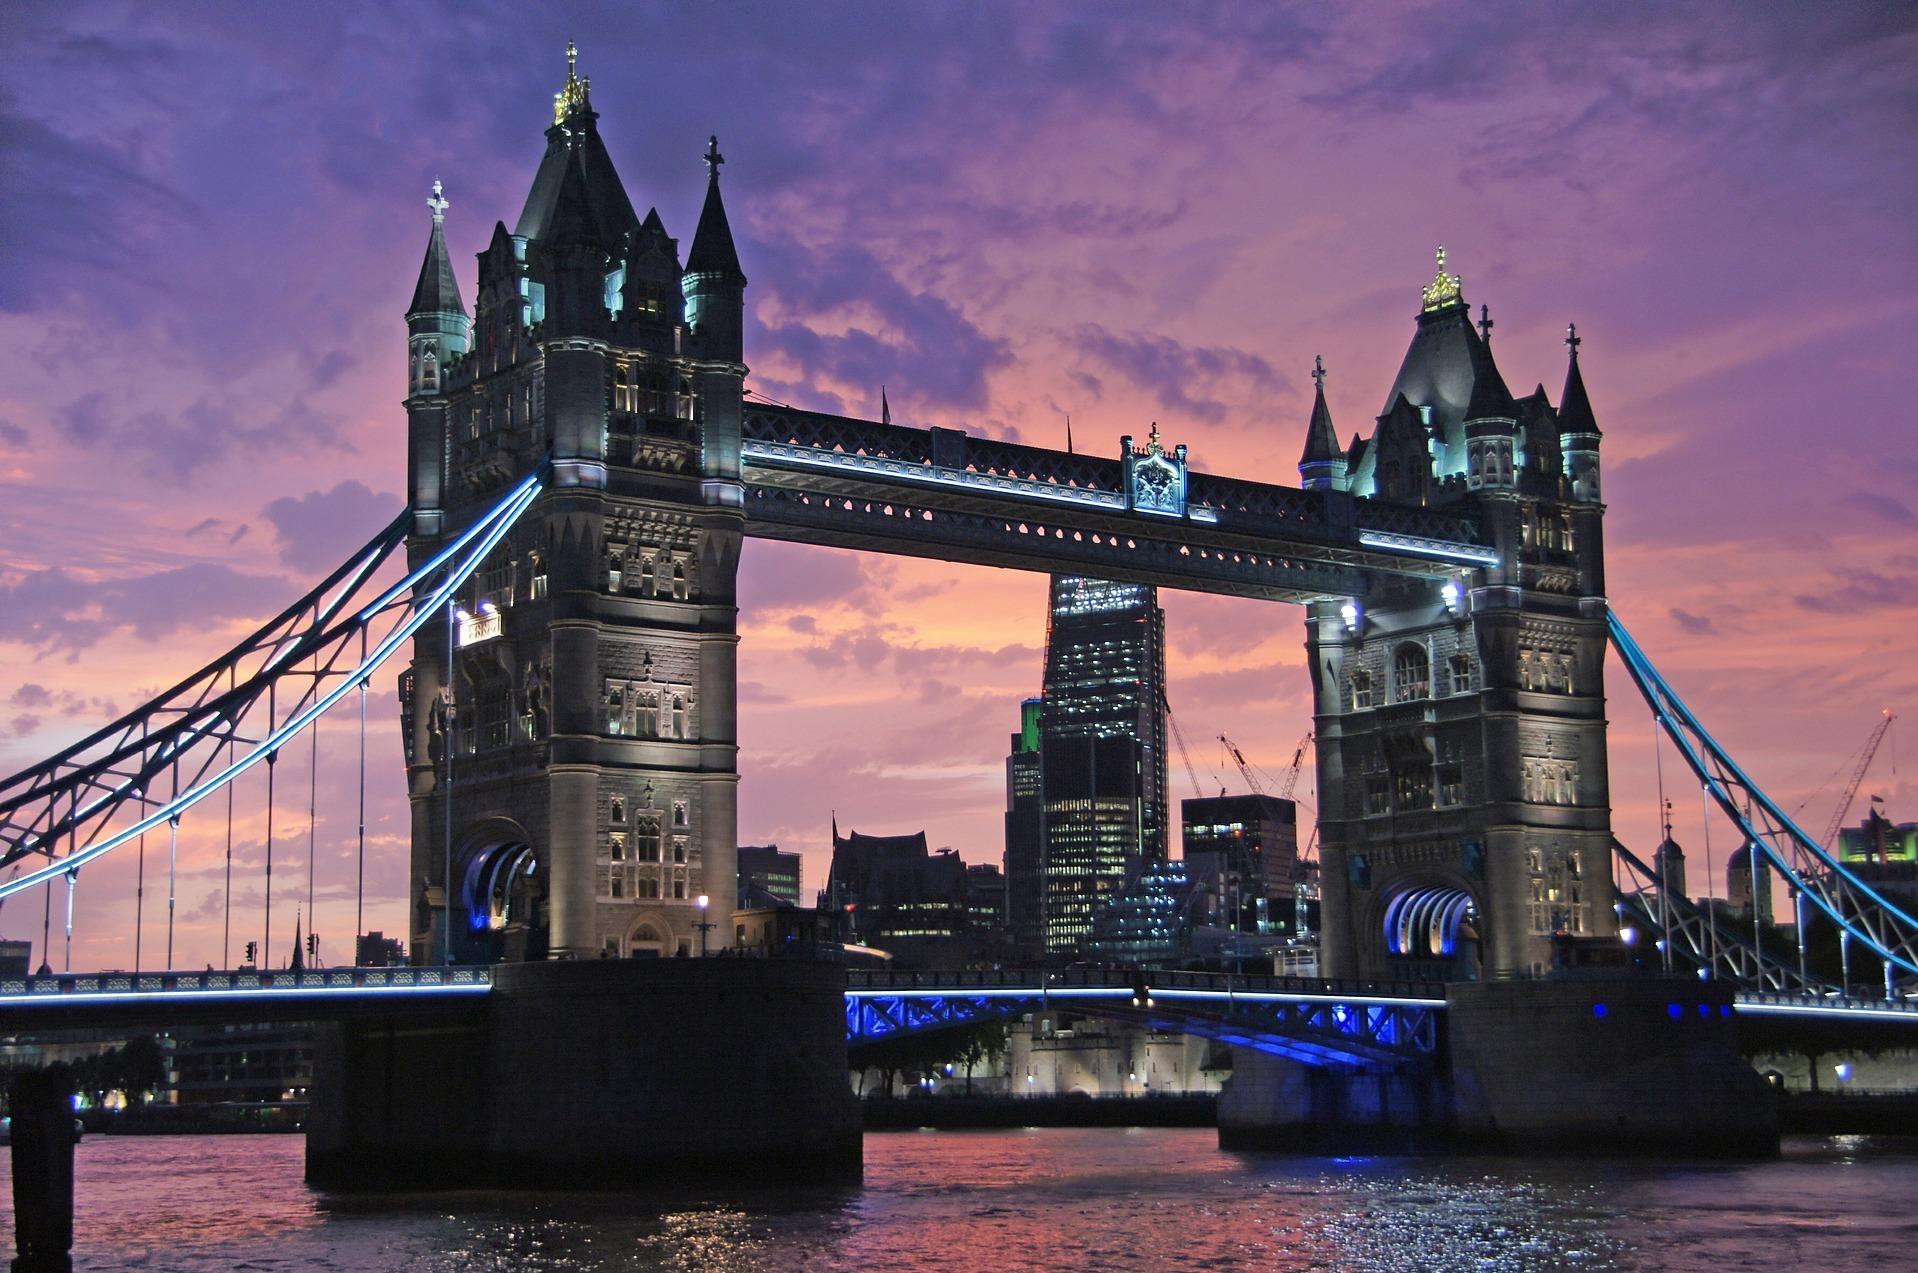 London, England at dusk